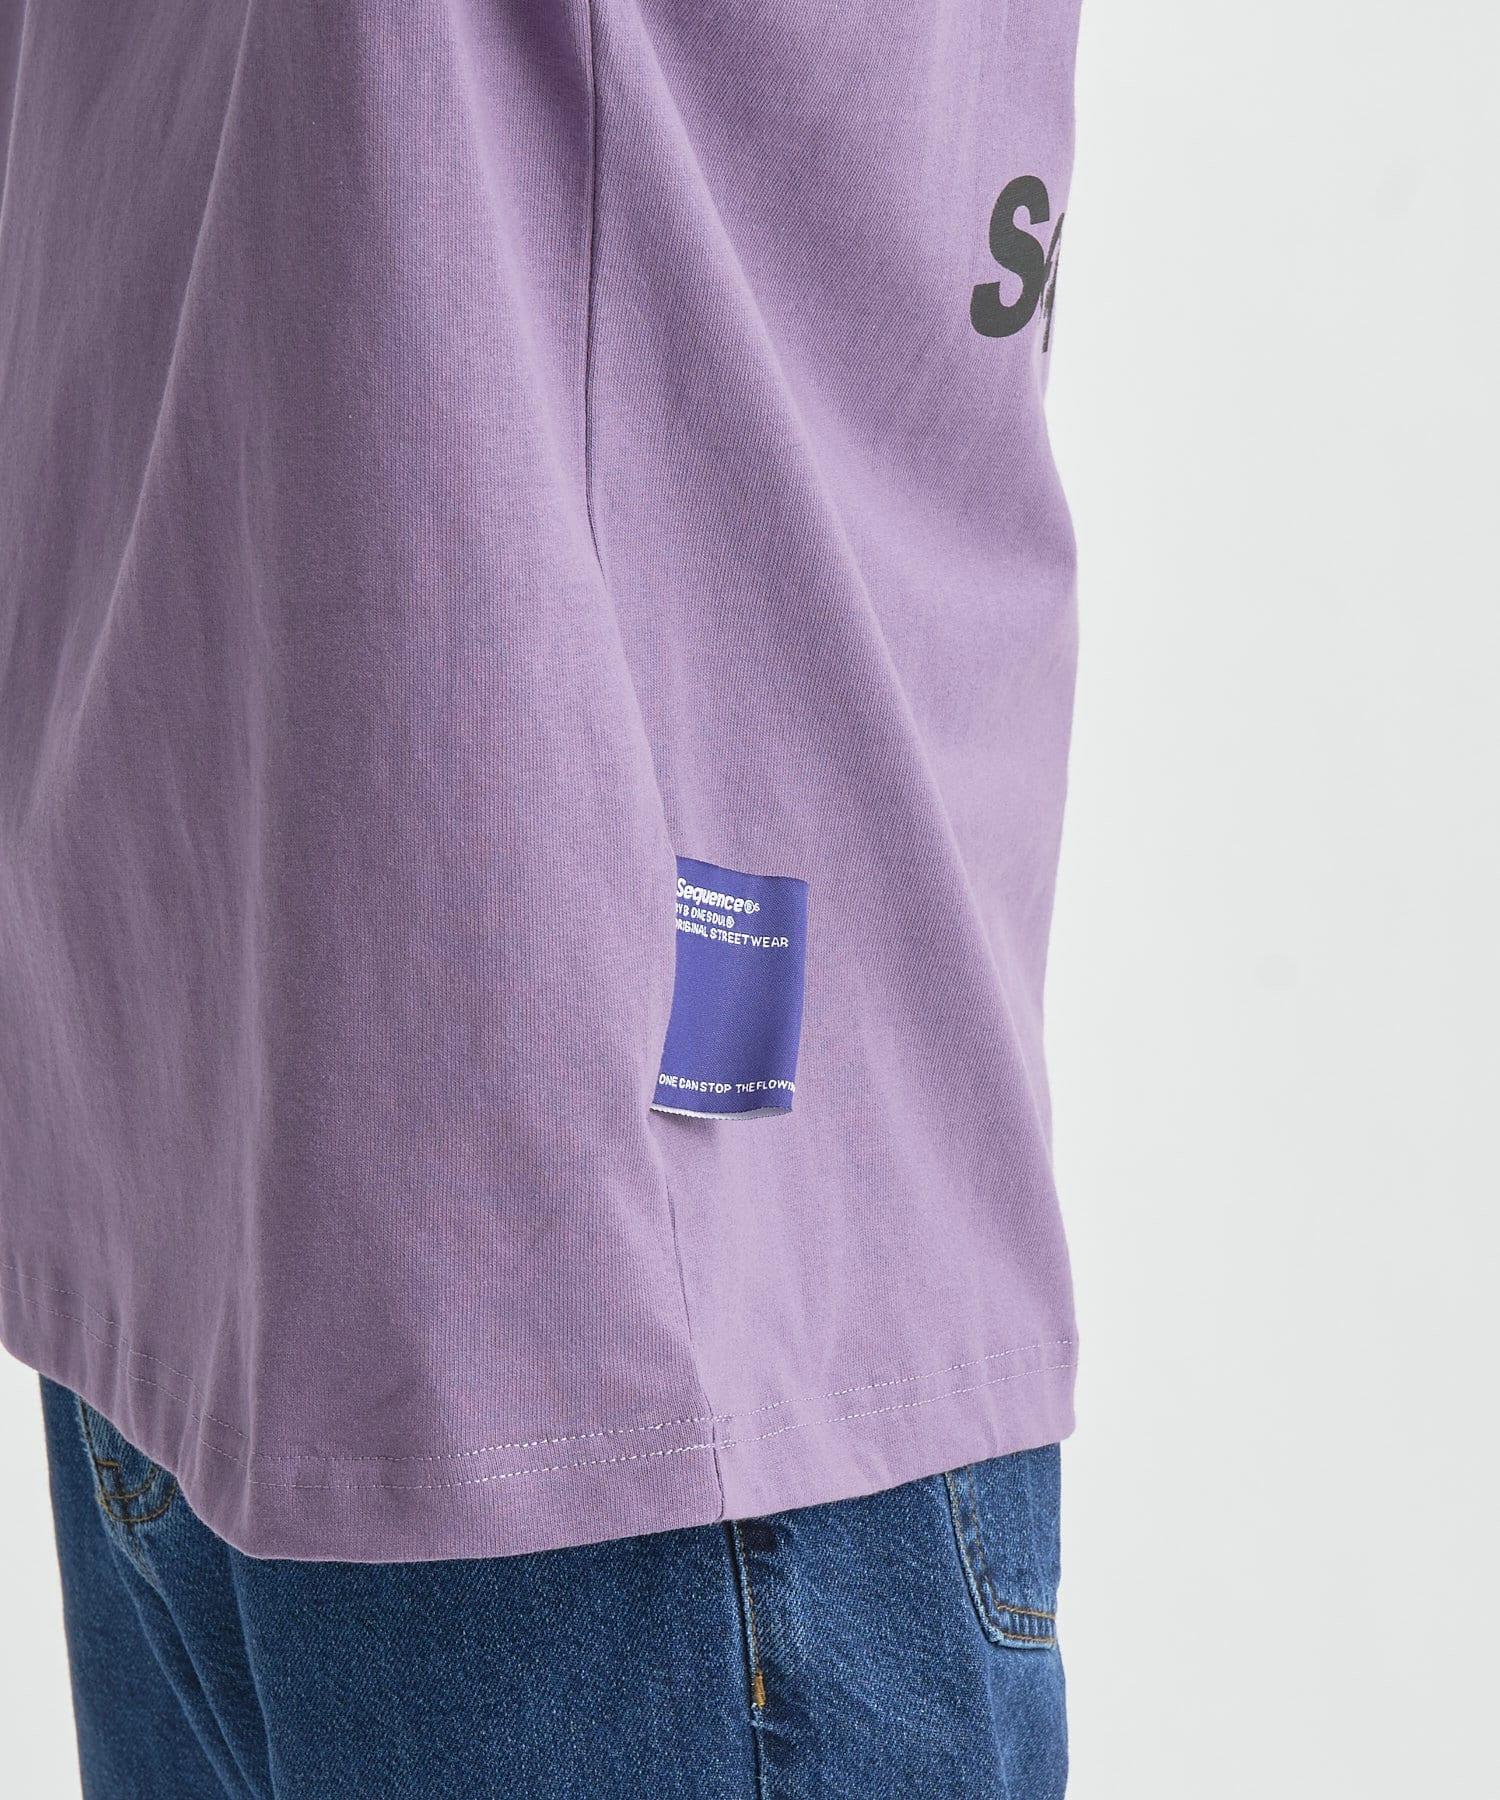 CPCM(シーピーシーエム) 【トムとジェリー】 PLAY TAG Tシャツ【オンラインストア限定商品】